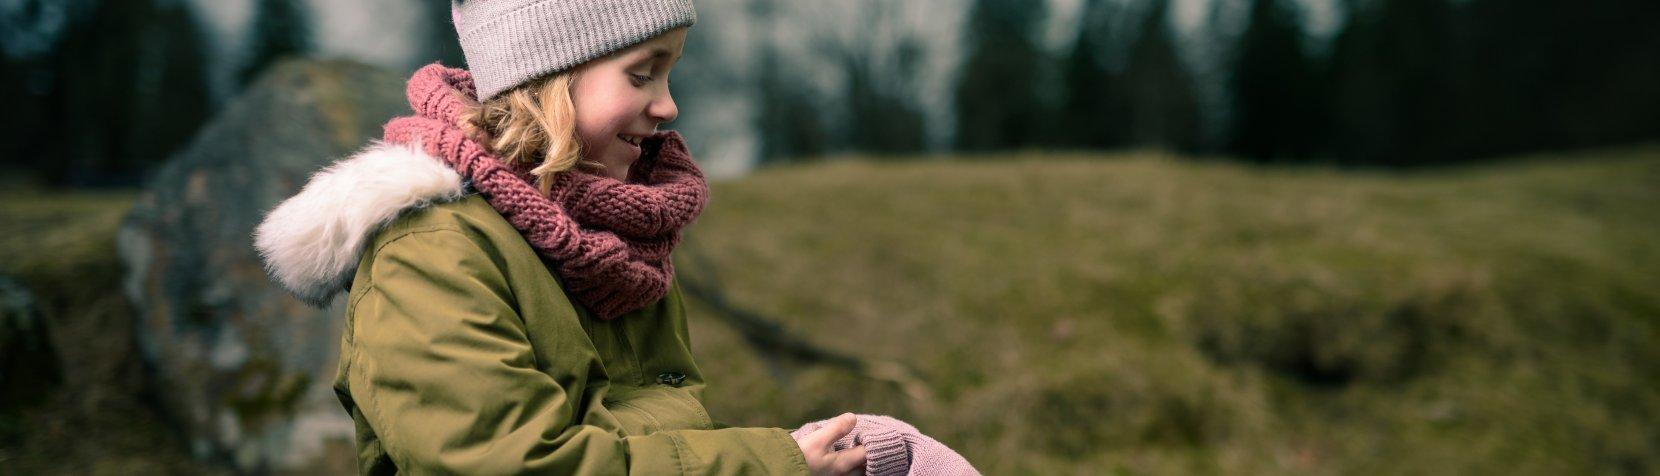 Foto: Barn i naturen